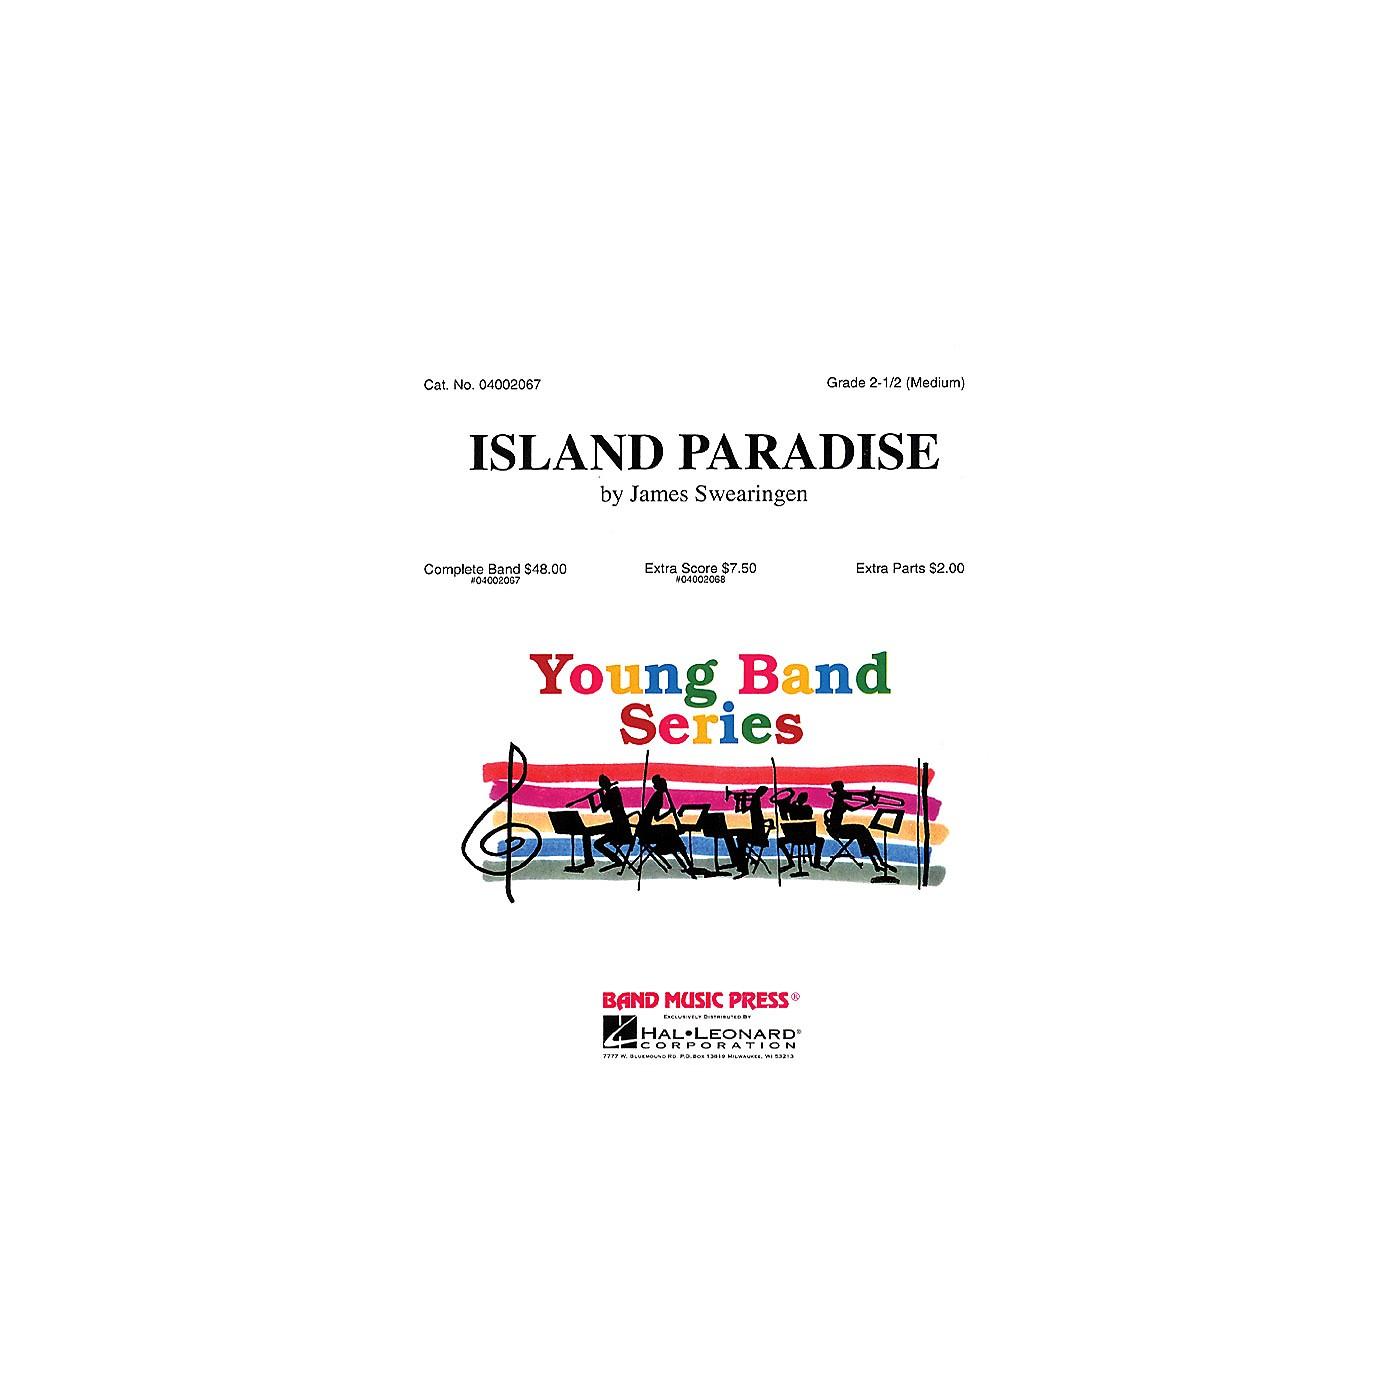 Hal Leonard Island Paradise (Band Music Press) Concert Band Level 2.5 Composed by James Swearingen thumbnail